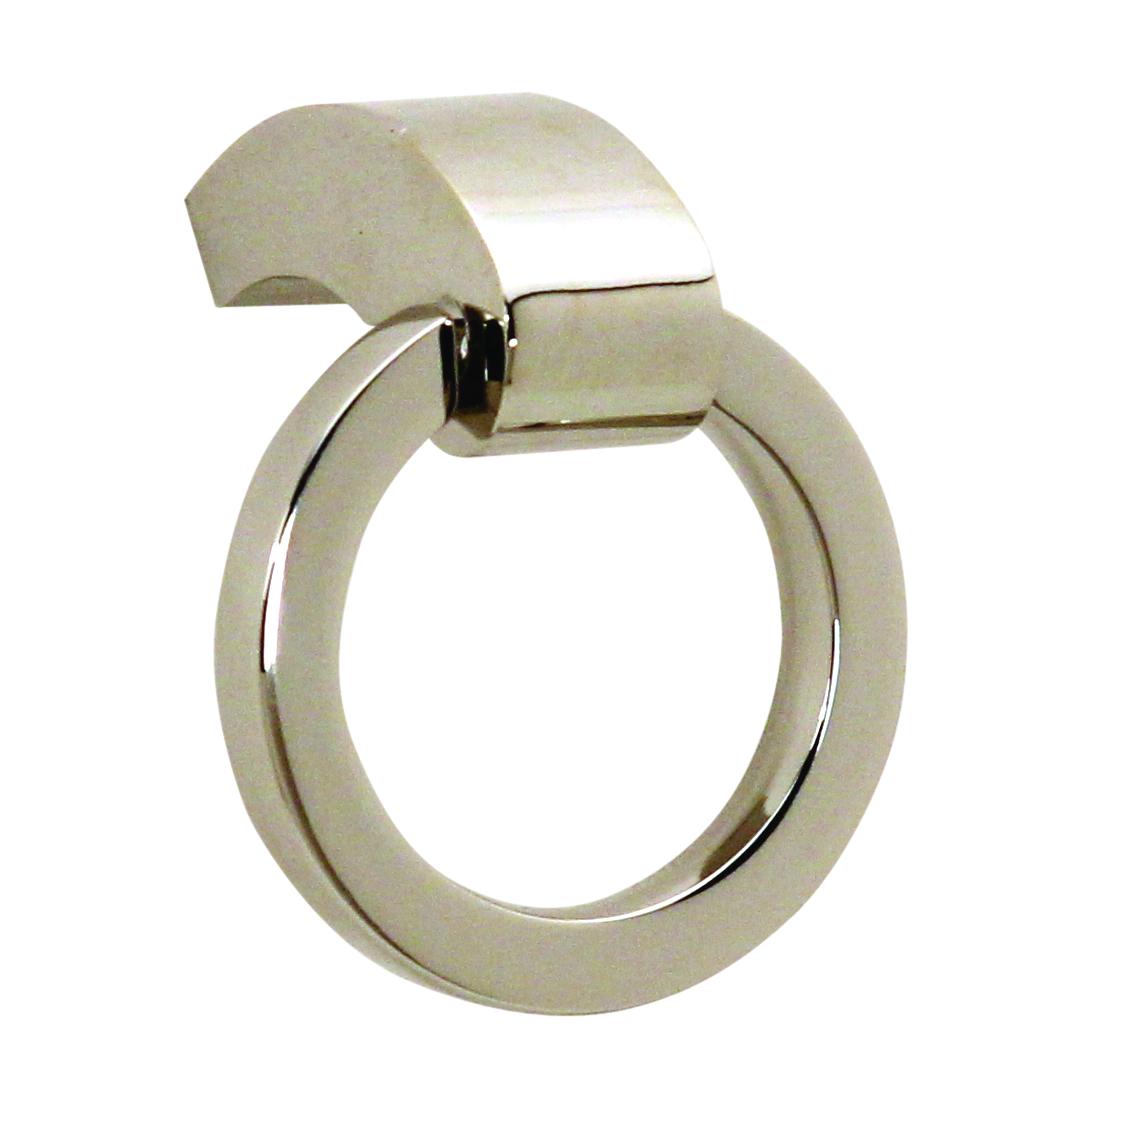 Circa Ring Pull A260